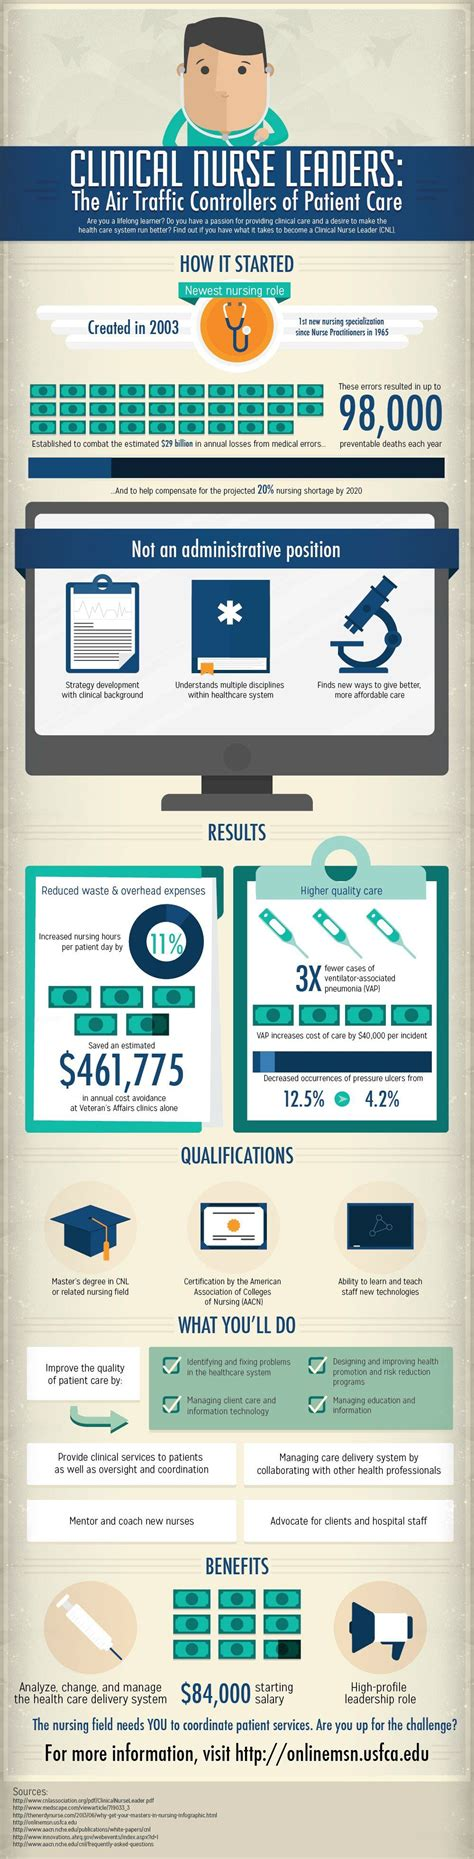 infographic clinical nurse leaders nurseslabs